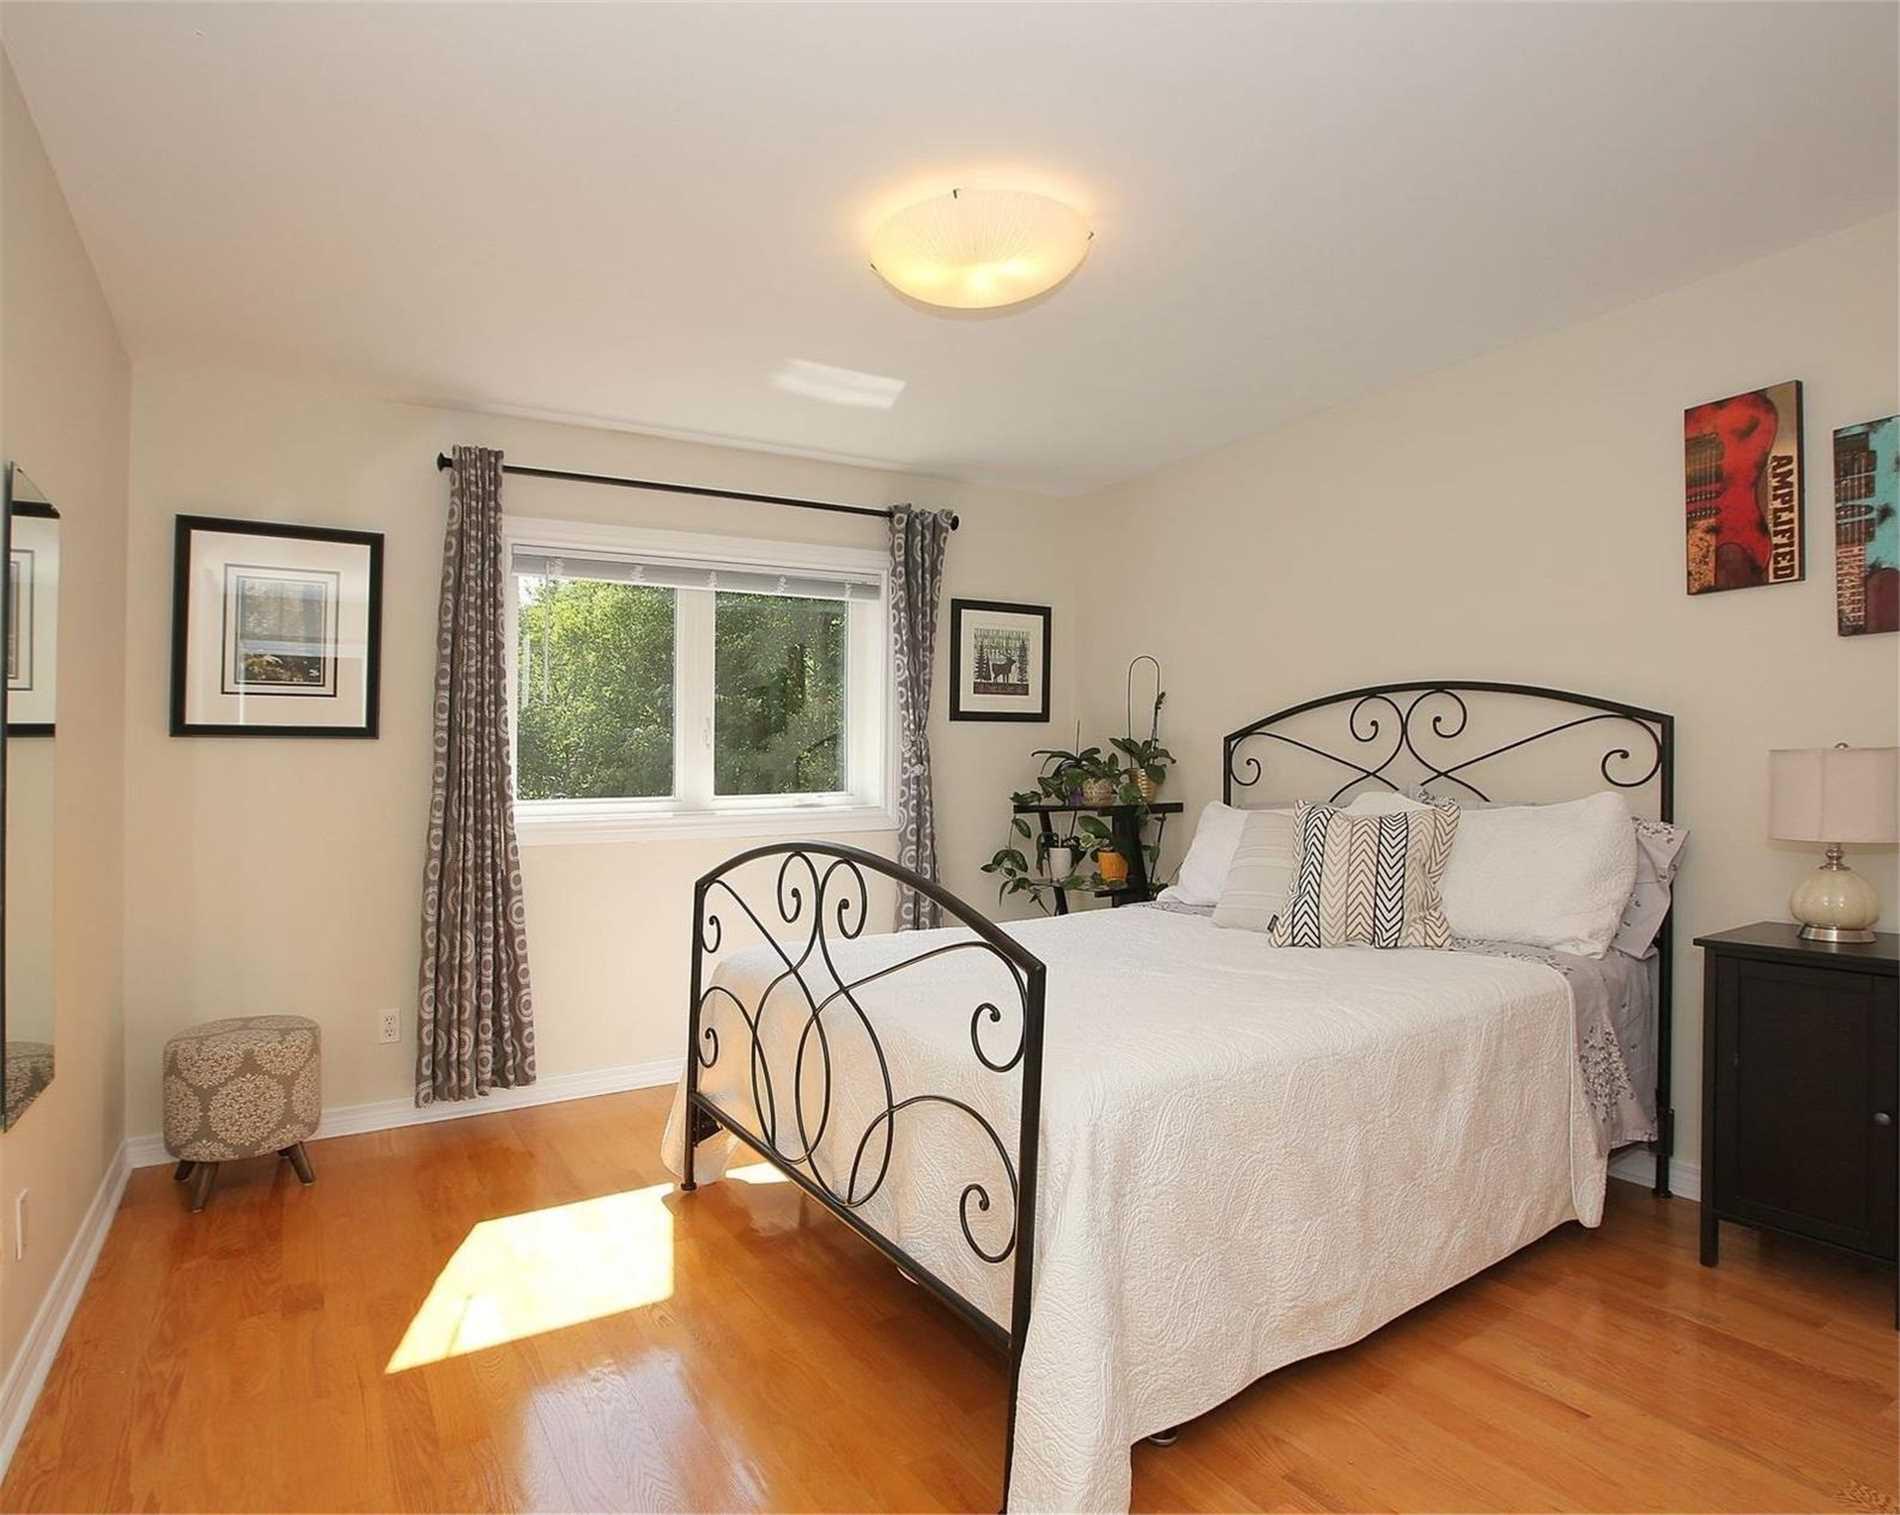 Detached house For Sale In Toronto - 67 Moreau Tr, Toronto, Ontario, Canada M1L4V2 , 4 Bedrooms Bedrooms, ,4 BathroomsBathrooms,Detached,For Sale,Moreau